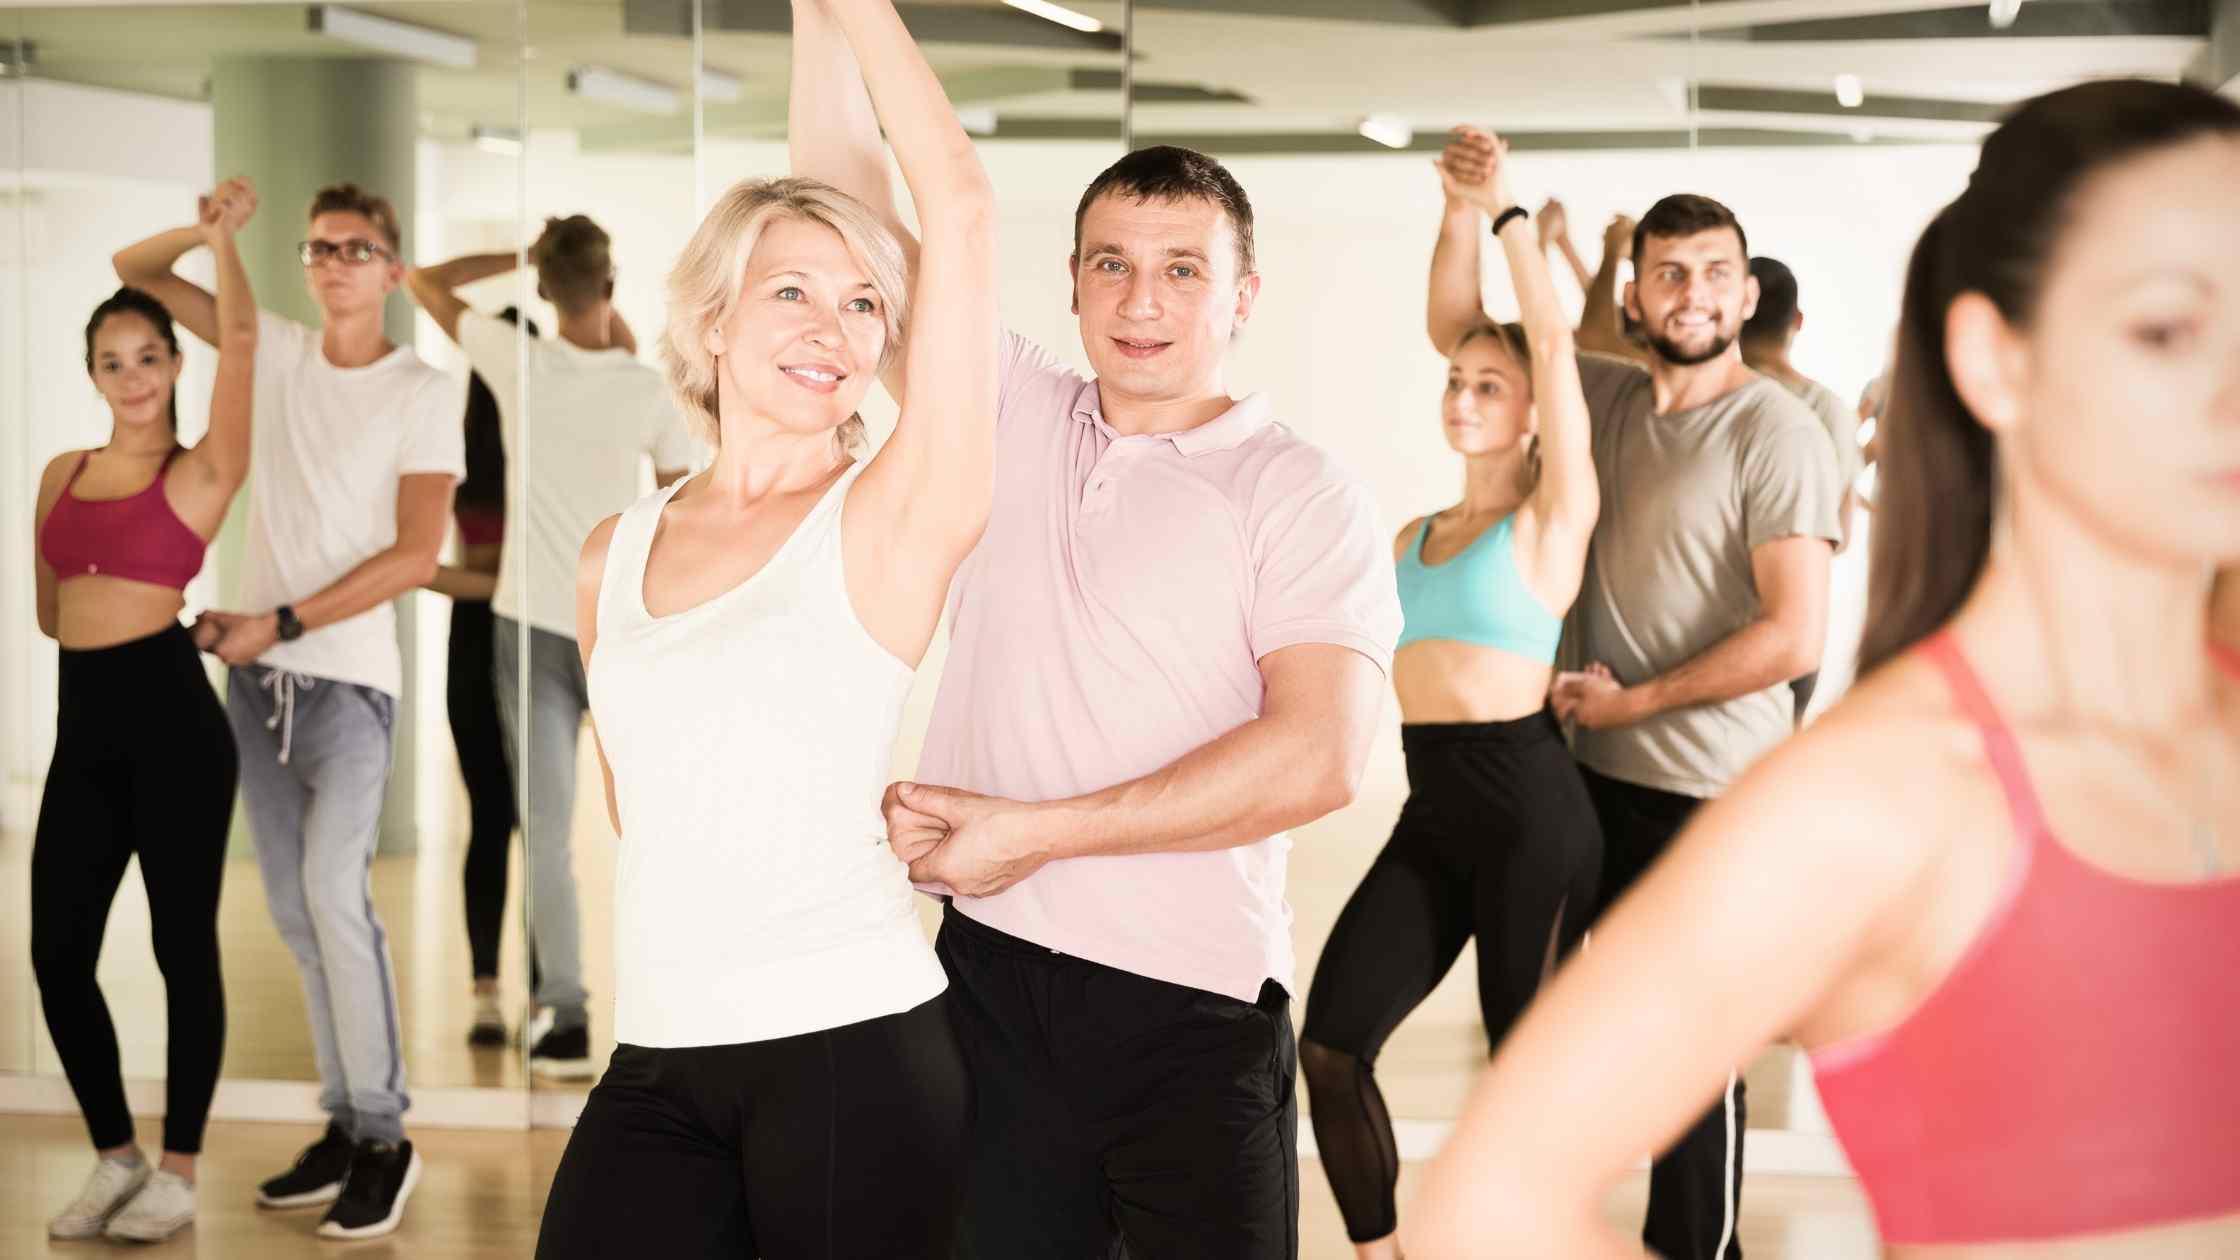 Health Benefits of Ballroom Dancing